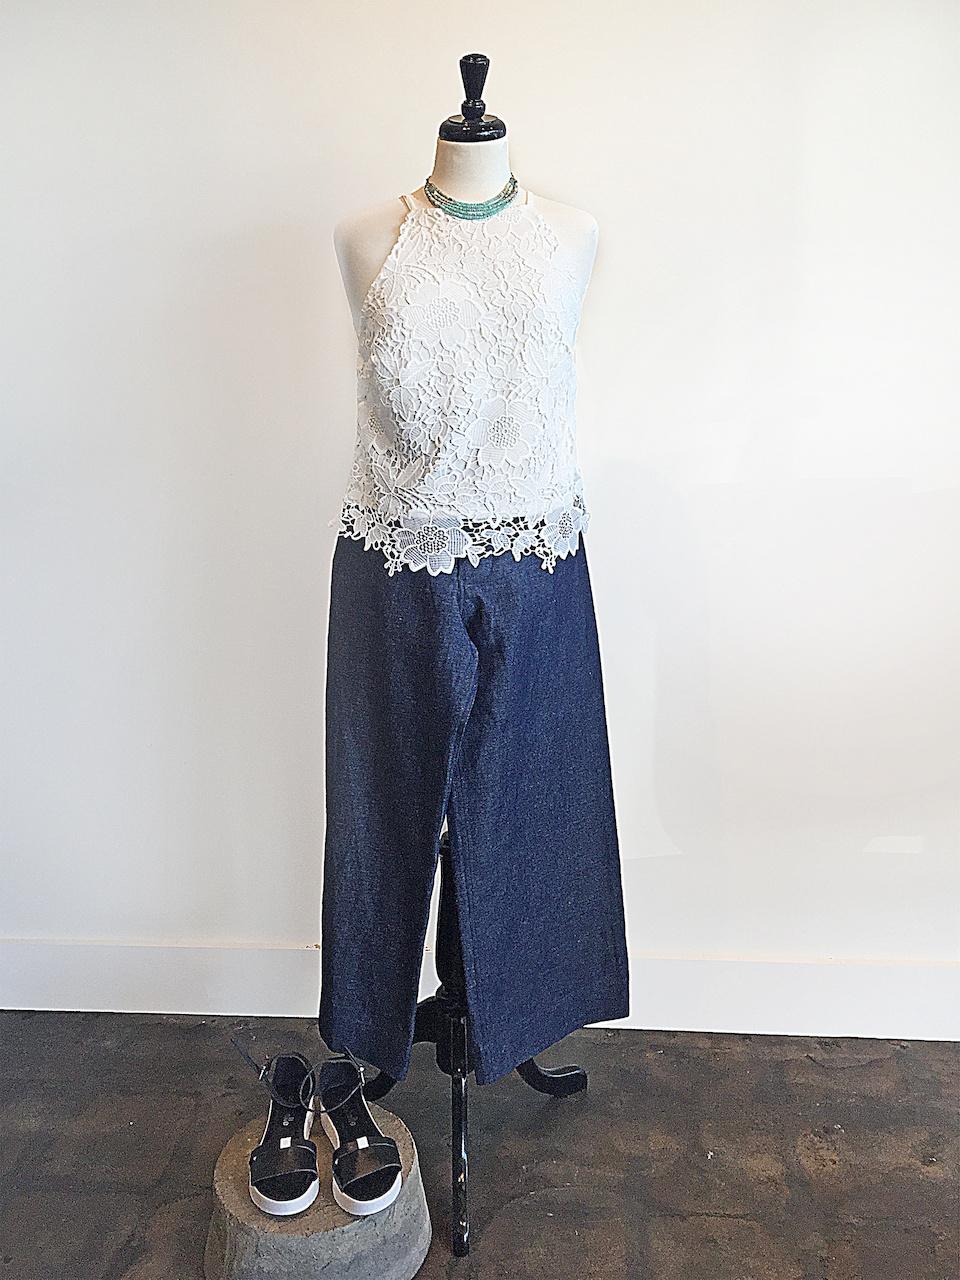 SB-Atlanta-WTWJune2016-RiverMint-jeans.JPG